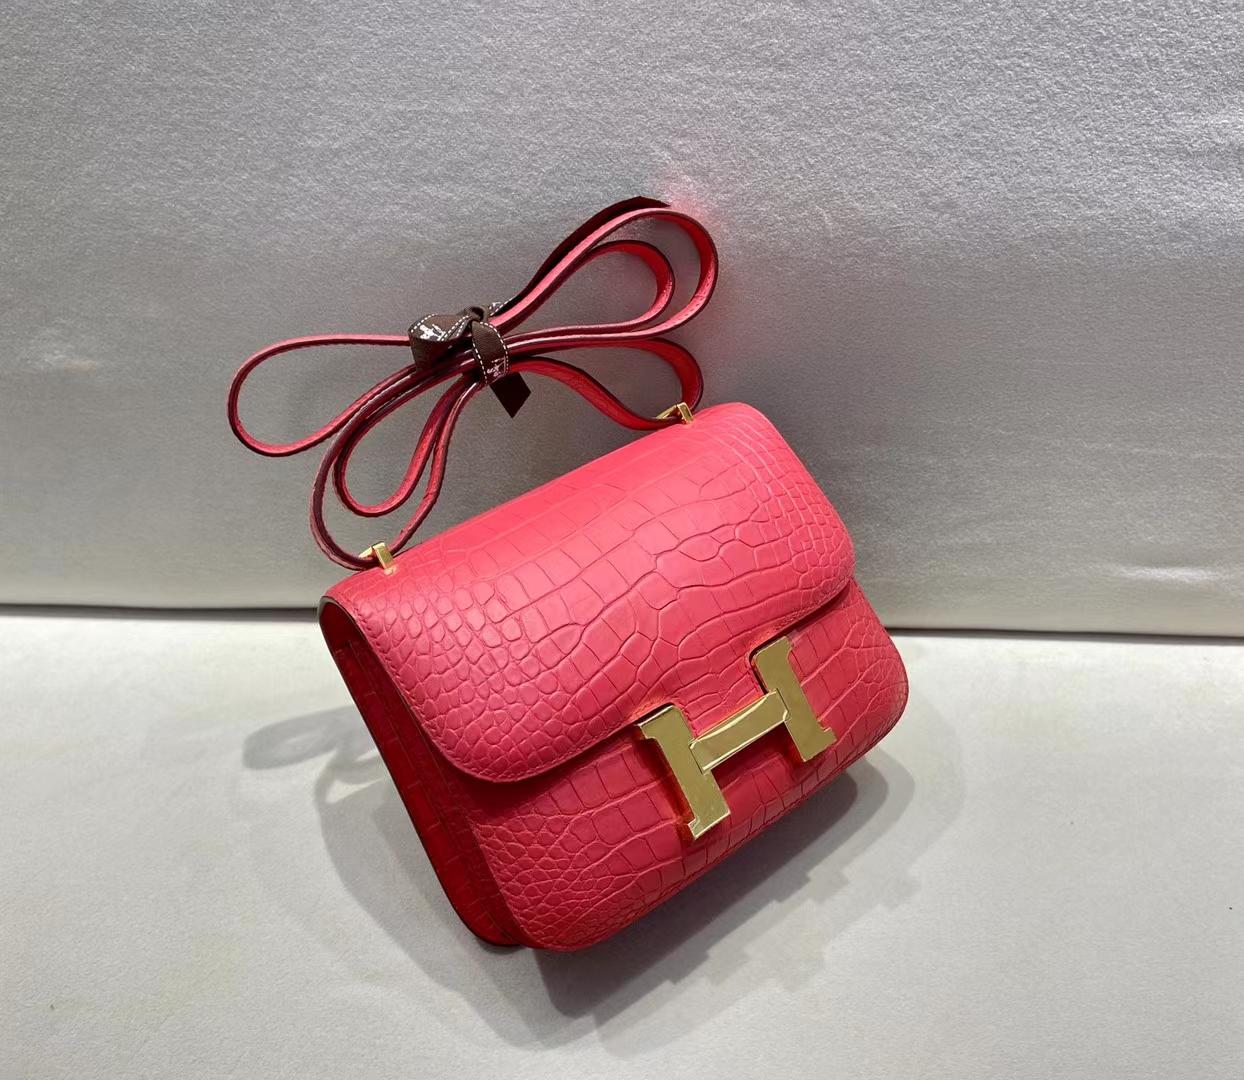 Hermès(爱马仕)Constance 19cm 金扣 雾面鳄鱼 杜鹃粉 顶级纯手工